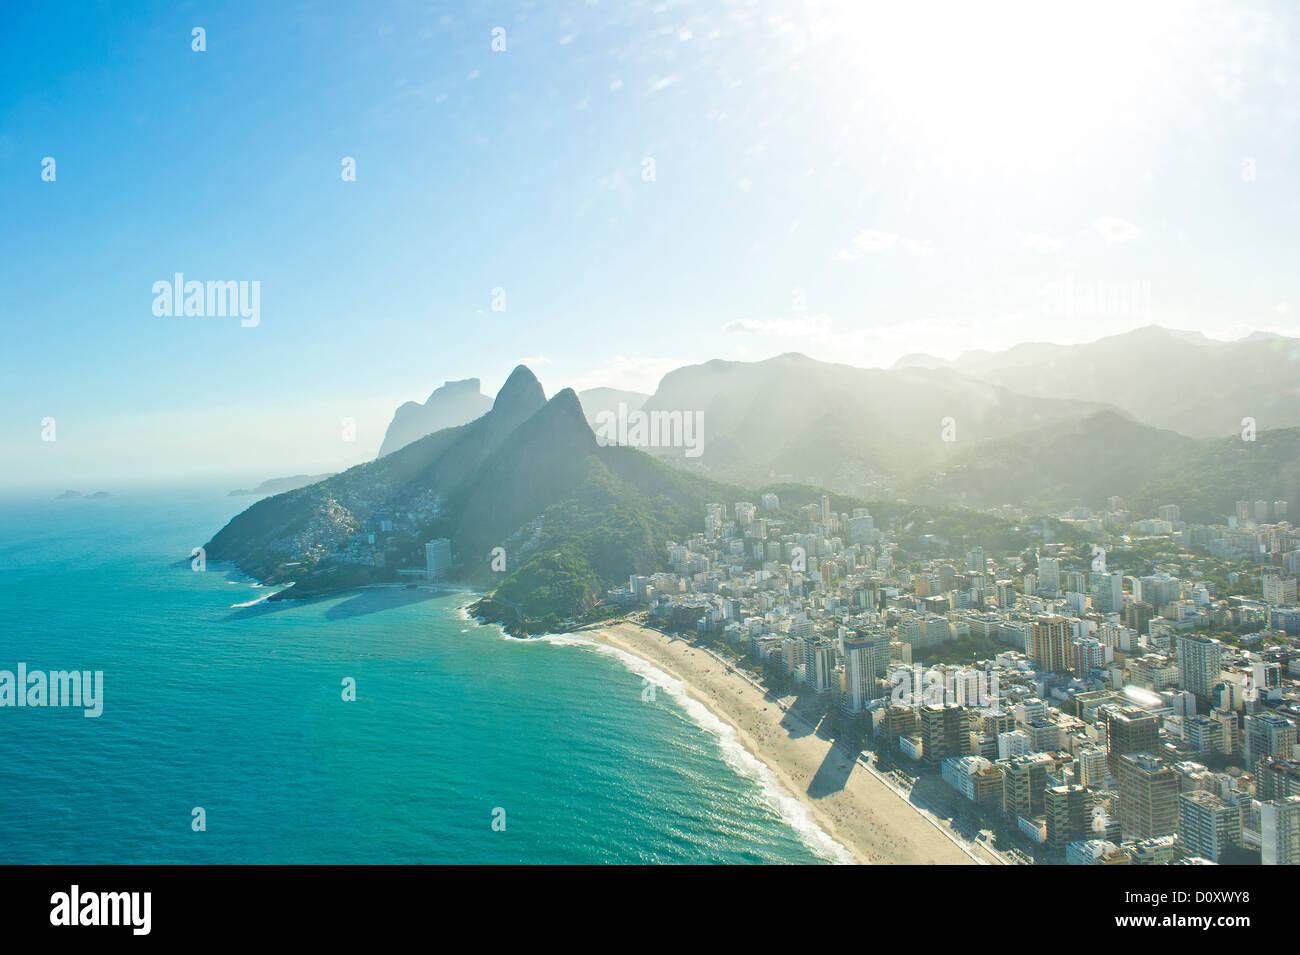 Aerial view of Ipanema Beach and Morro Dois Irmaos, Rio de Janeiro, Brazil - Stock Image